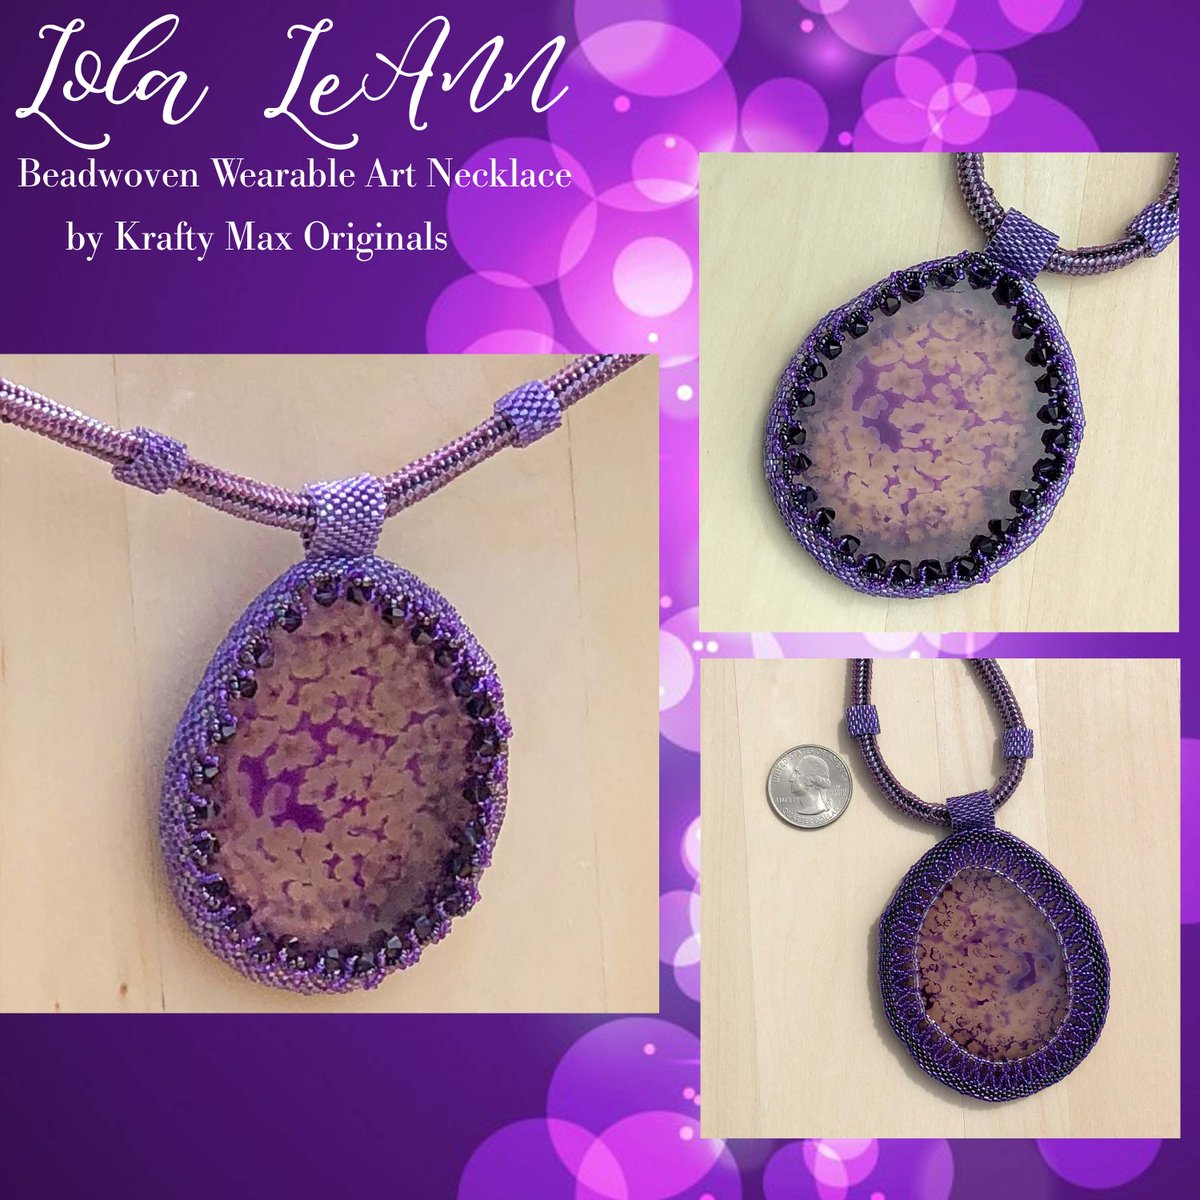 Lola LeAnn – Purple Agate Slice Beadwoven Wearable Art Necklace $147  #handmade #jewelry #supporthandmade #buyhandmade #handmadelove #jewelrydesigner #jewelryart #uniquejewelry #handcrafted #kraftymax #kmax